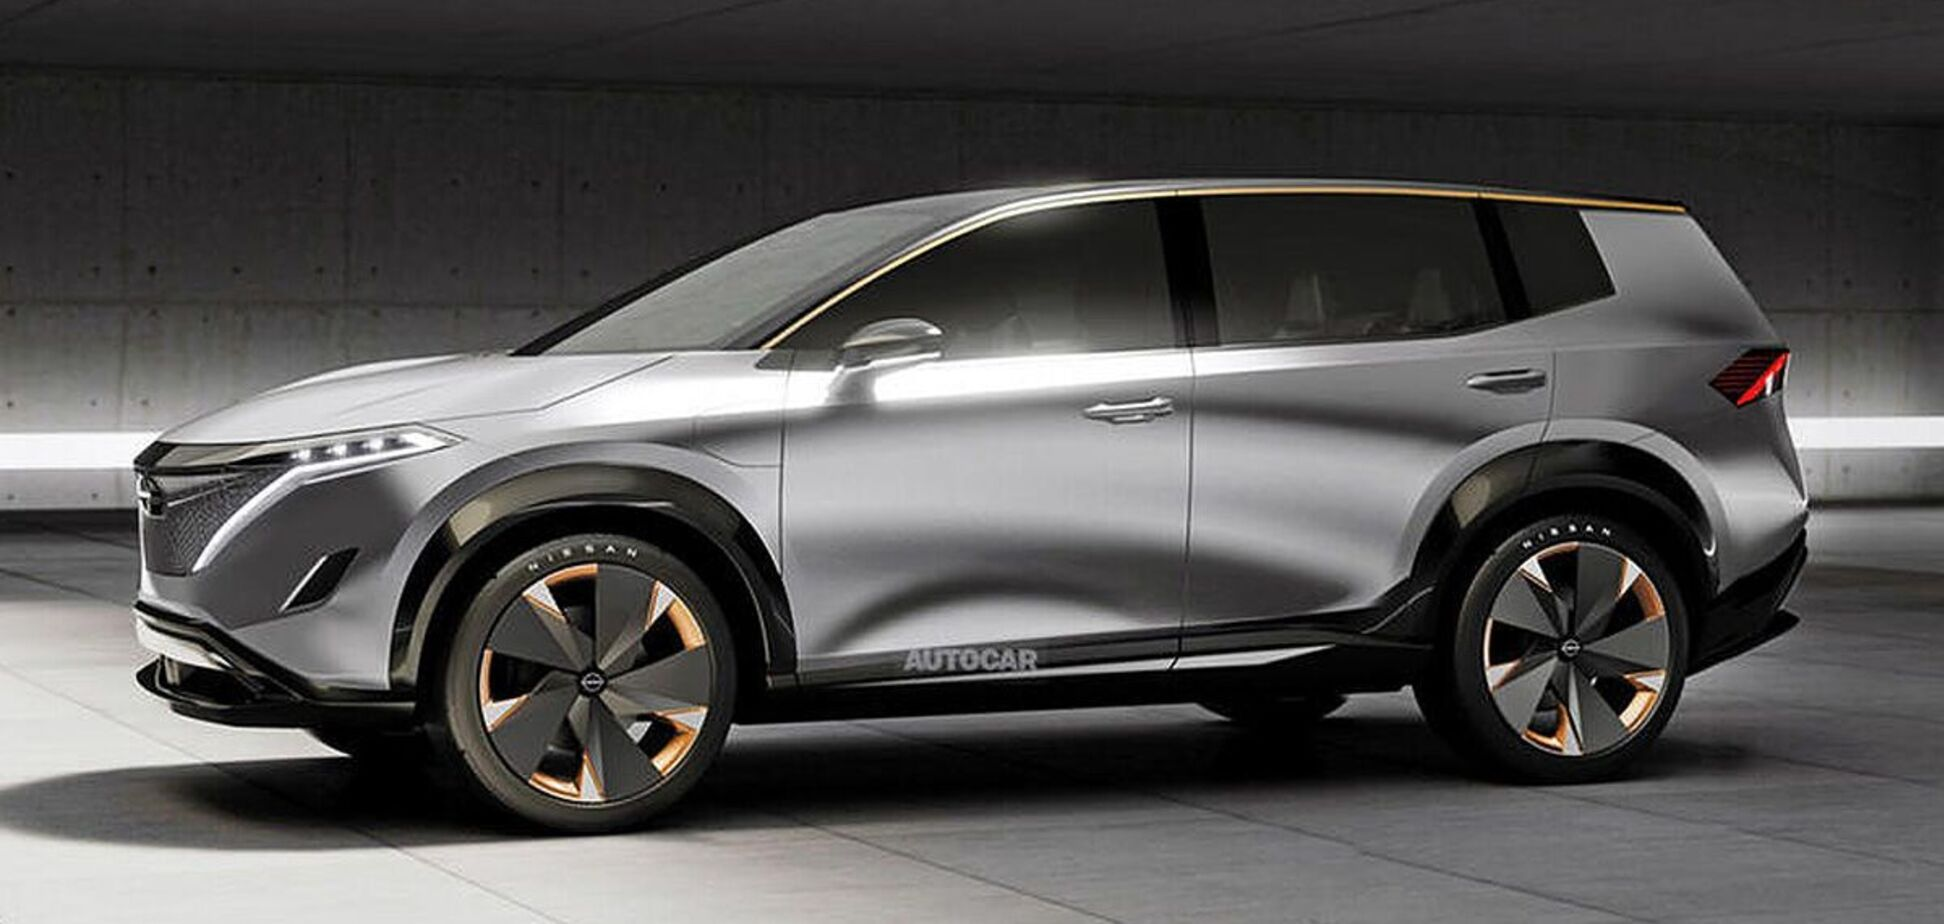 Nissan готує великий електричний SUV. Фото: autocar.co.uk